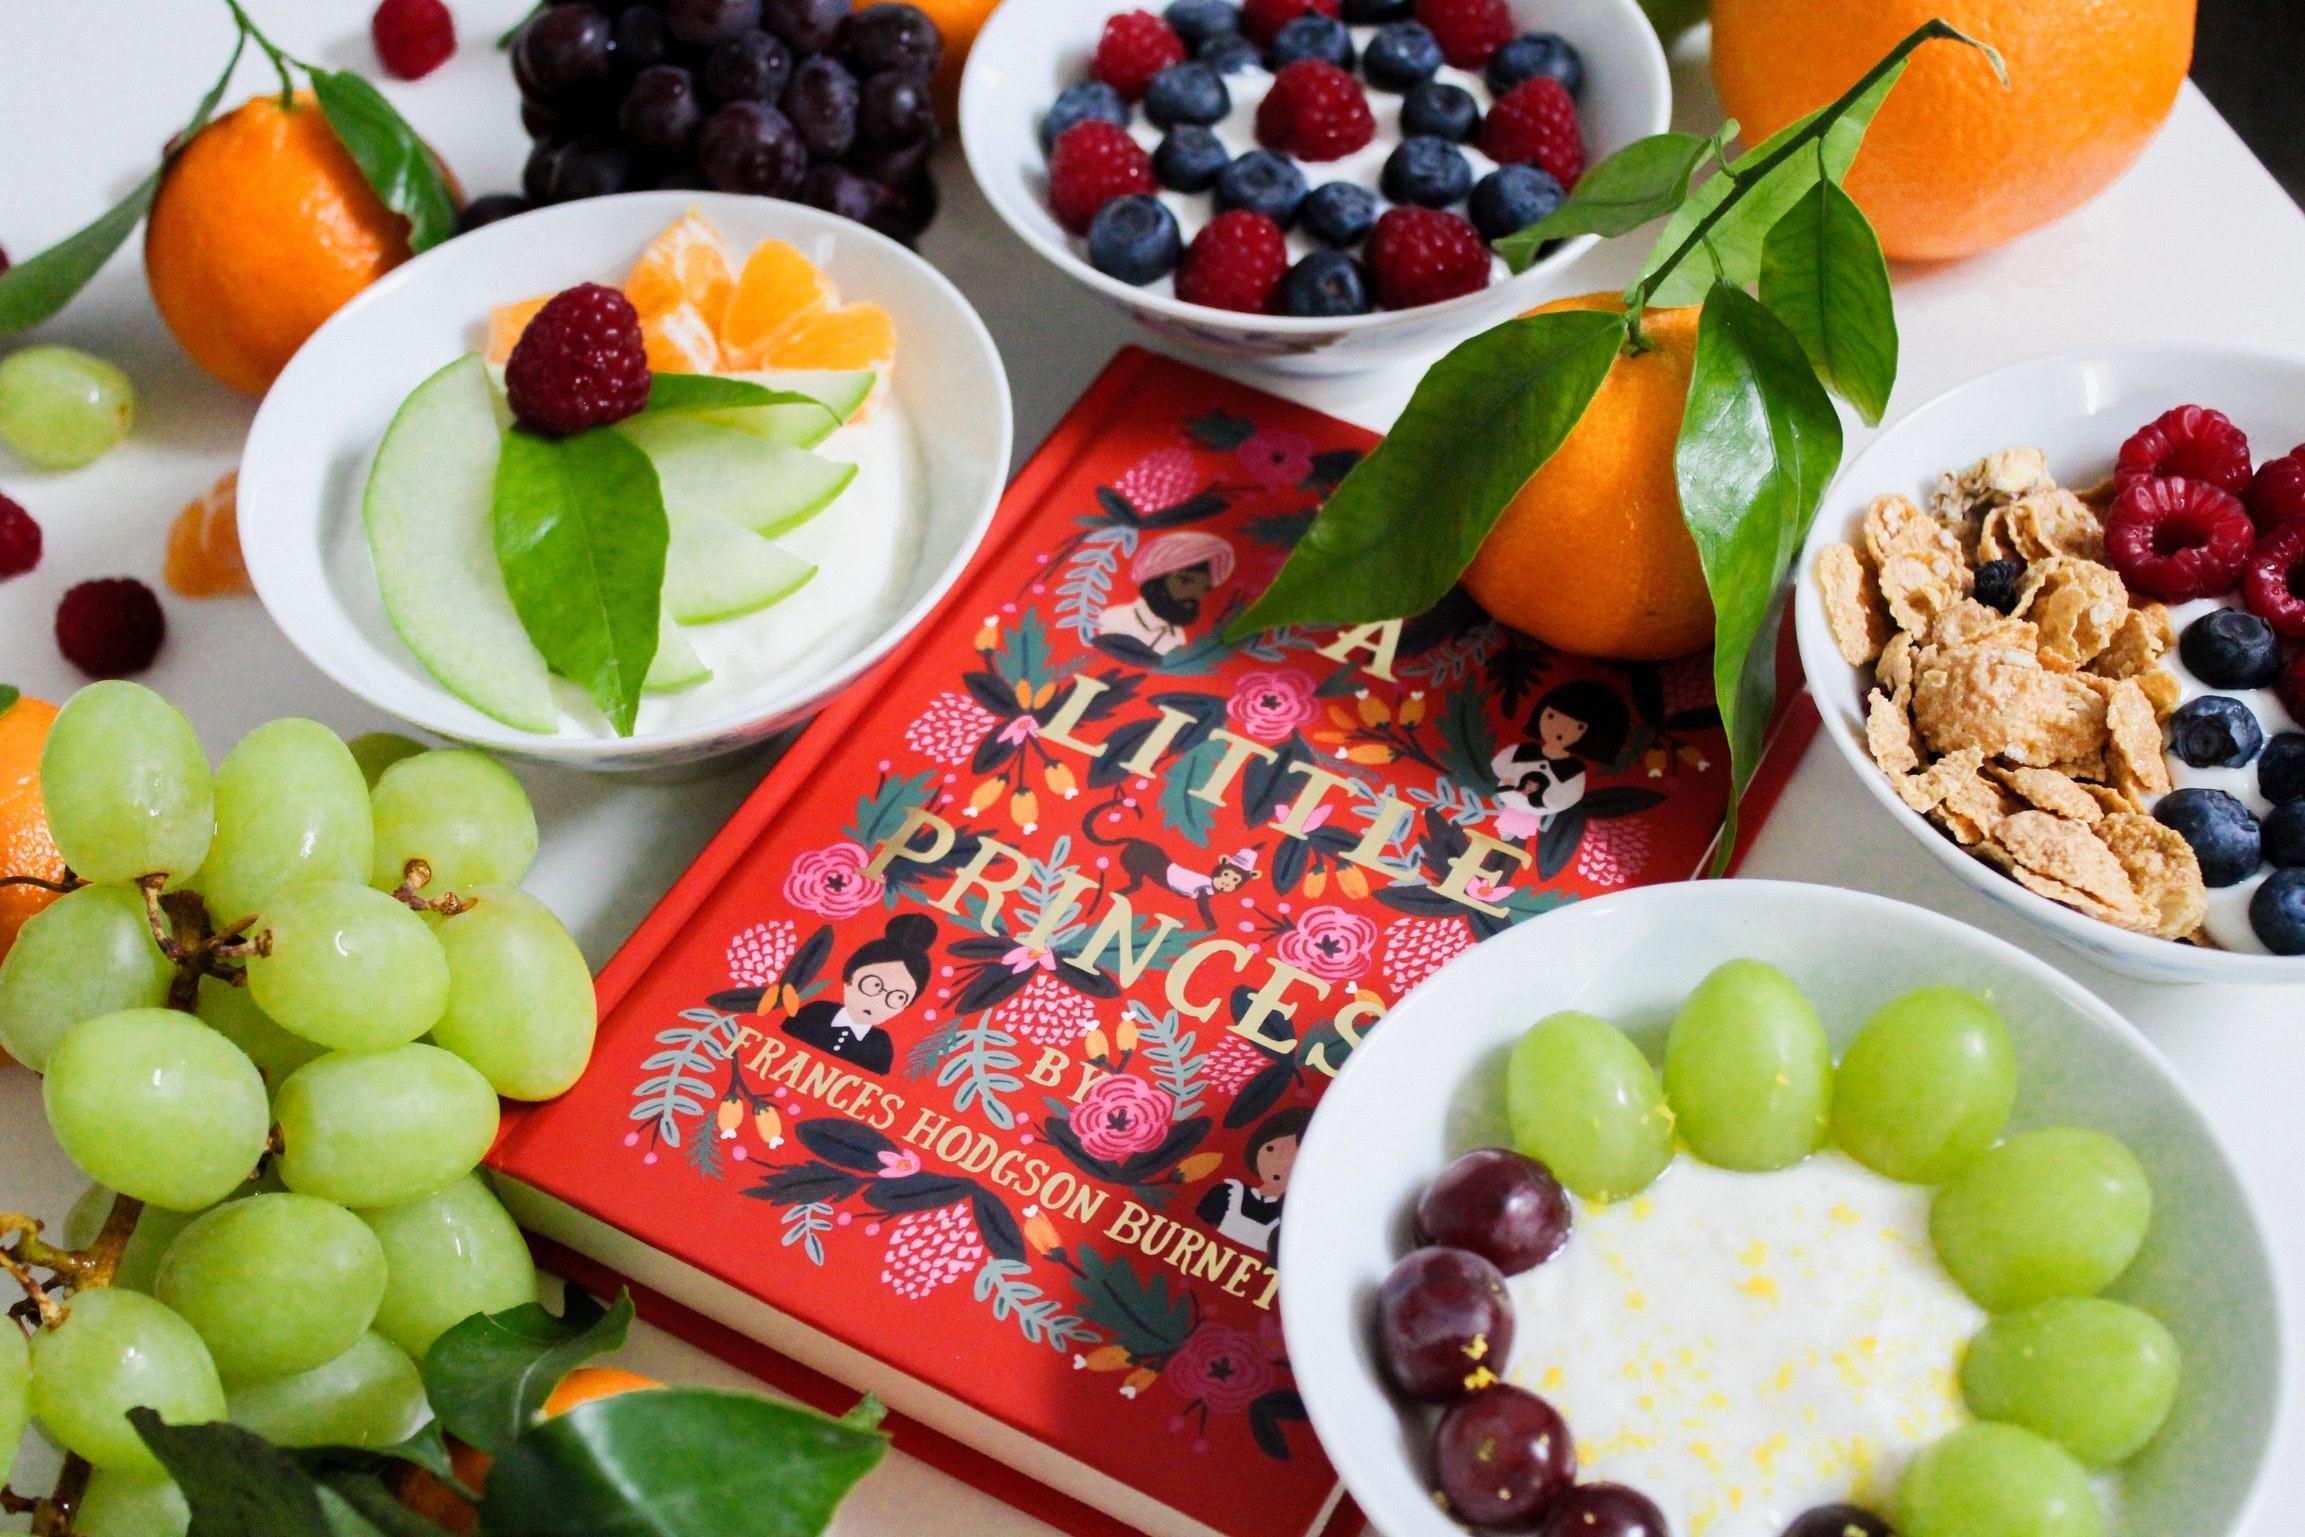 Free Images : apple, berries, book, breakfast, cereal bowl